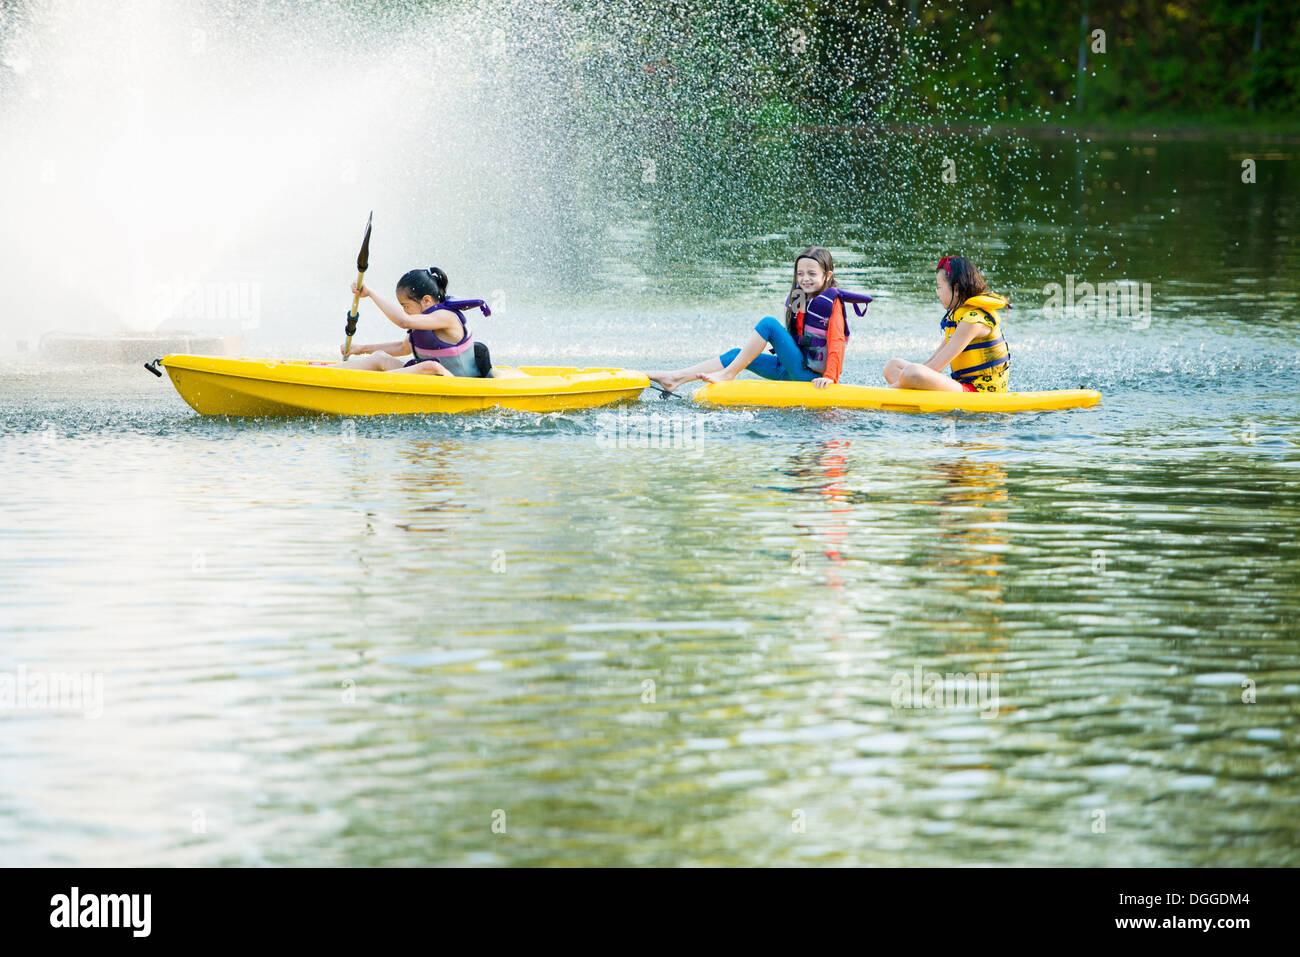 Girls canoeing on lake - Stock Image